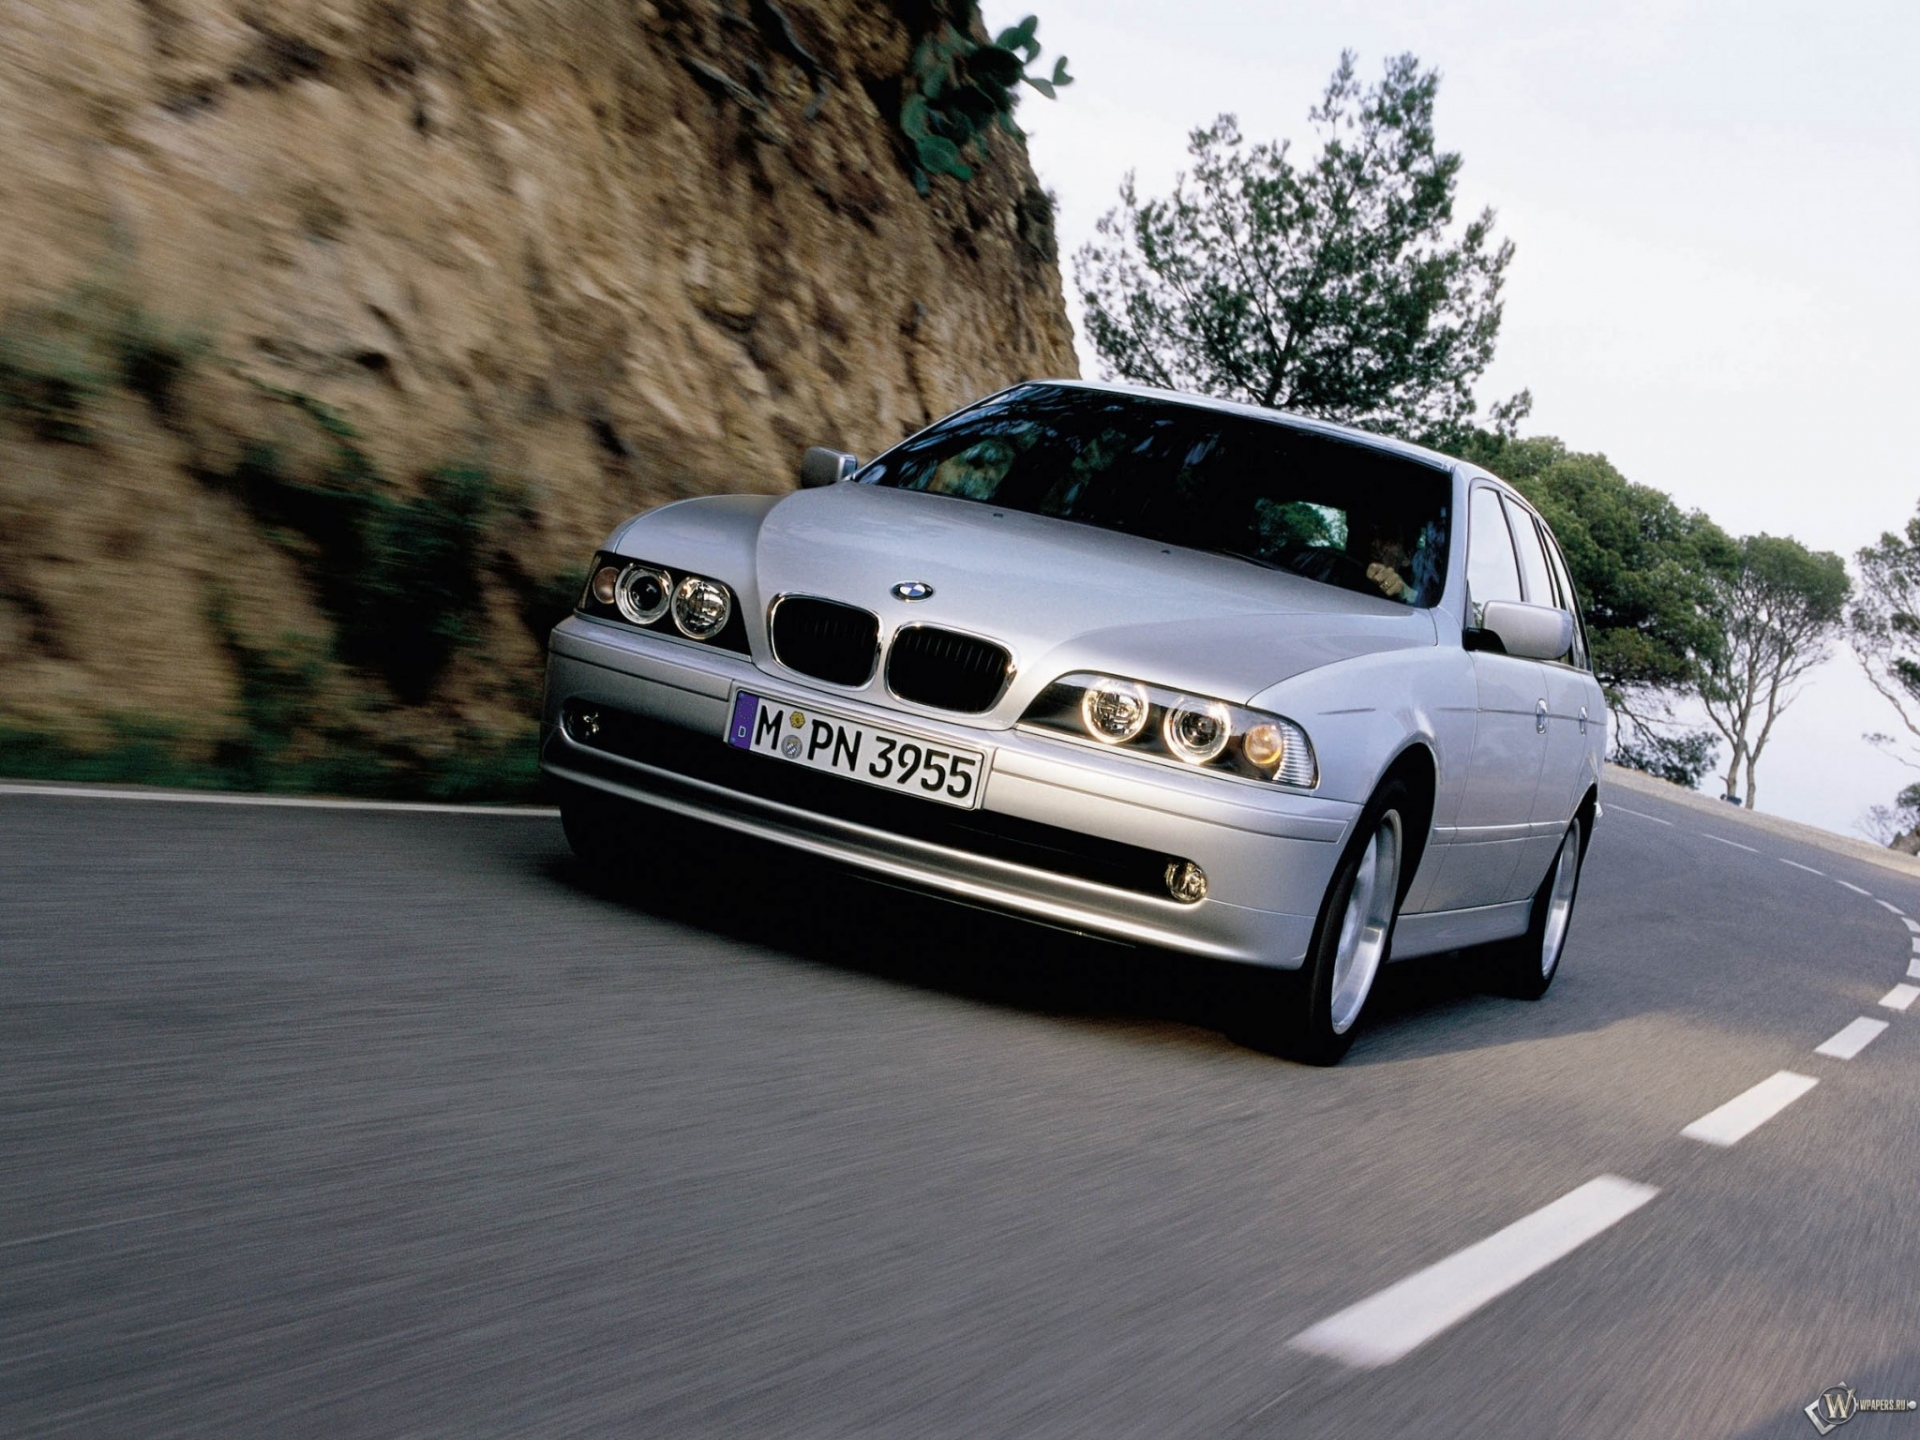 BMW - 5 Series Touring (2001) 1920x1440